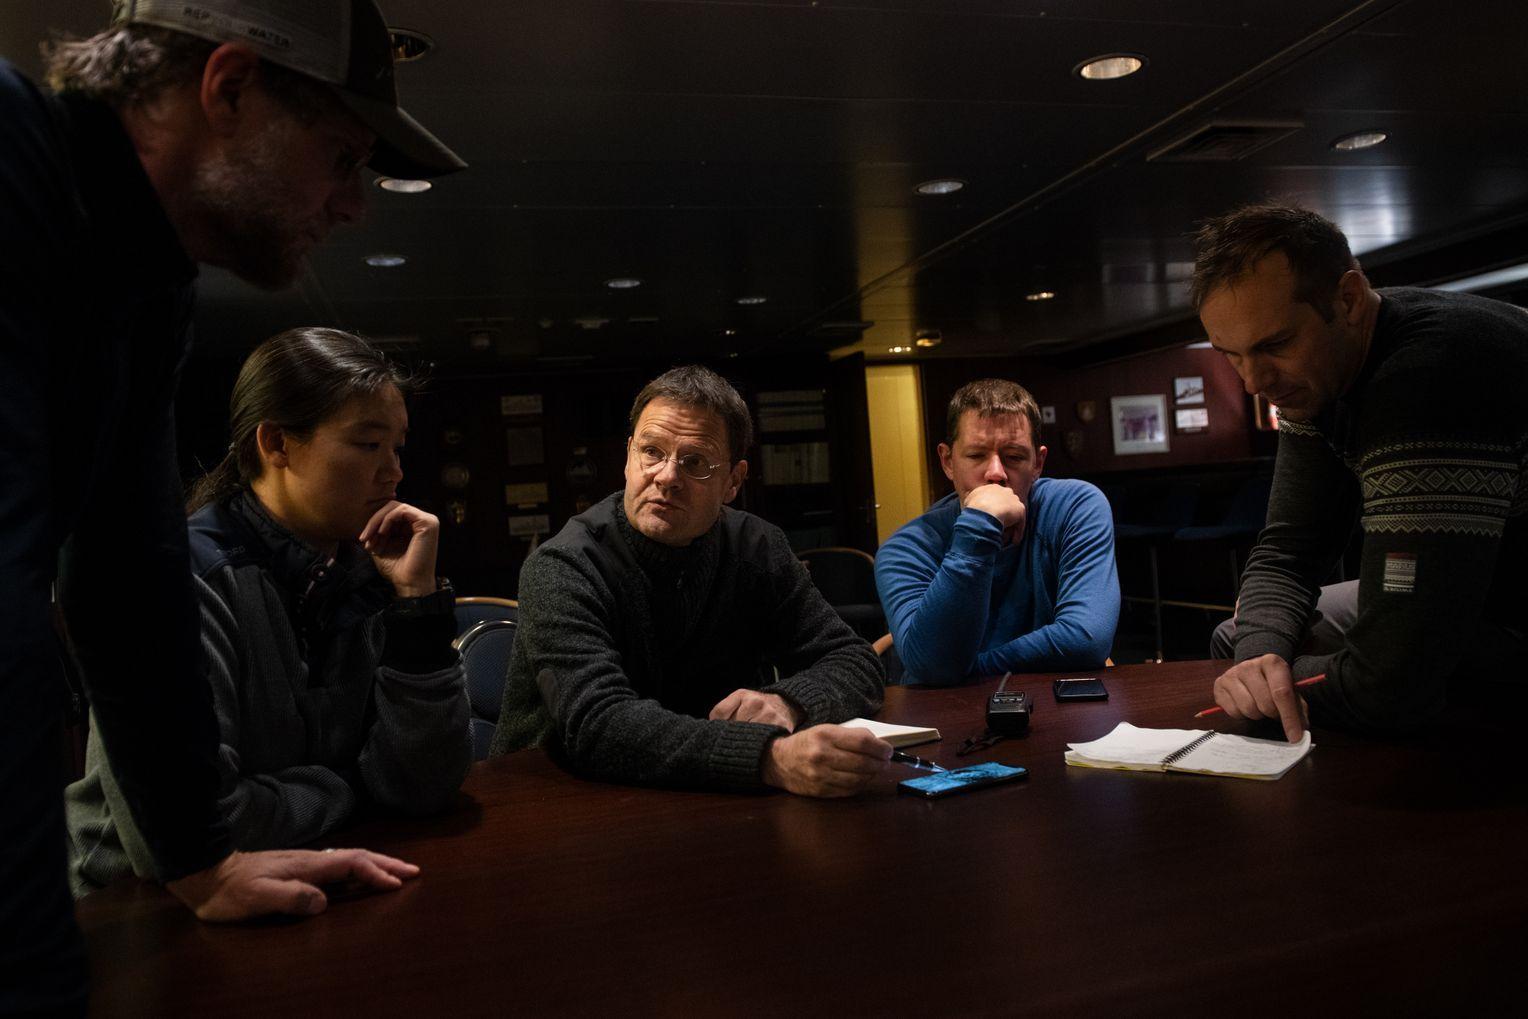 Lagebesprechung auf dem Schiff: Matthew Shupe, Allison Fong, Expeditionsleiter Markus Rex, Stefan Hendricks and Gunnar Spreen. Foto:Esther Horvath